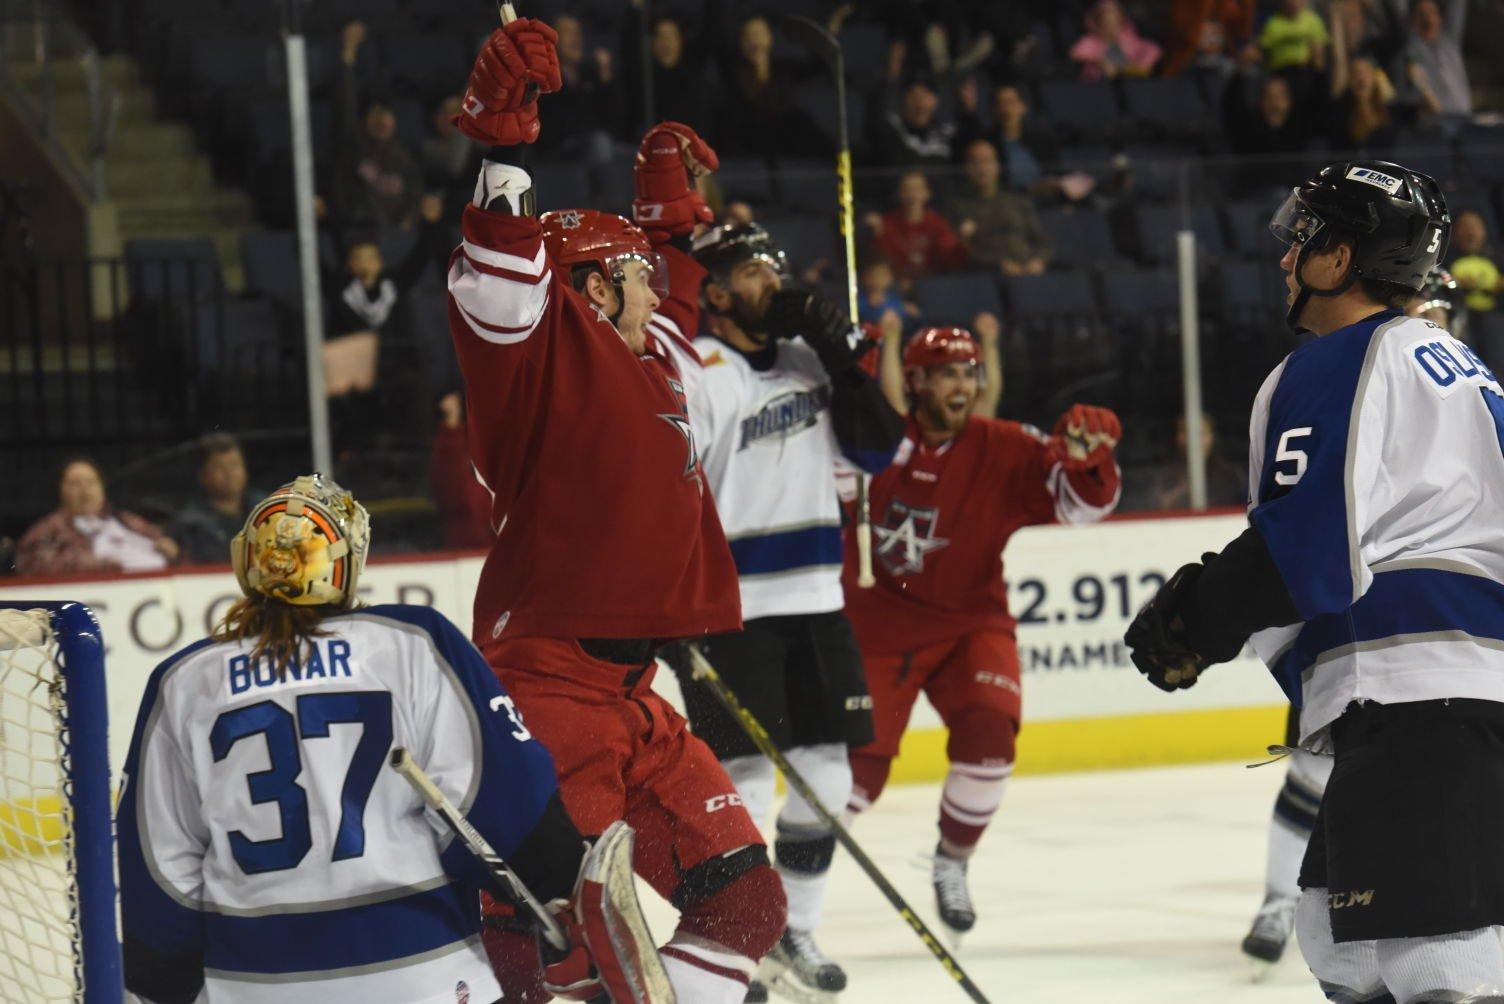 ECHL: Allen Americans Enter Week On Four-game Win Streak, Best League's Top Team